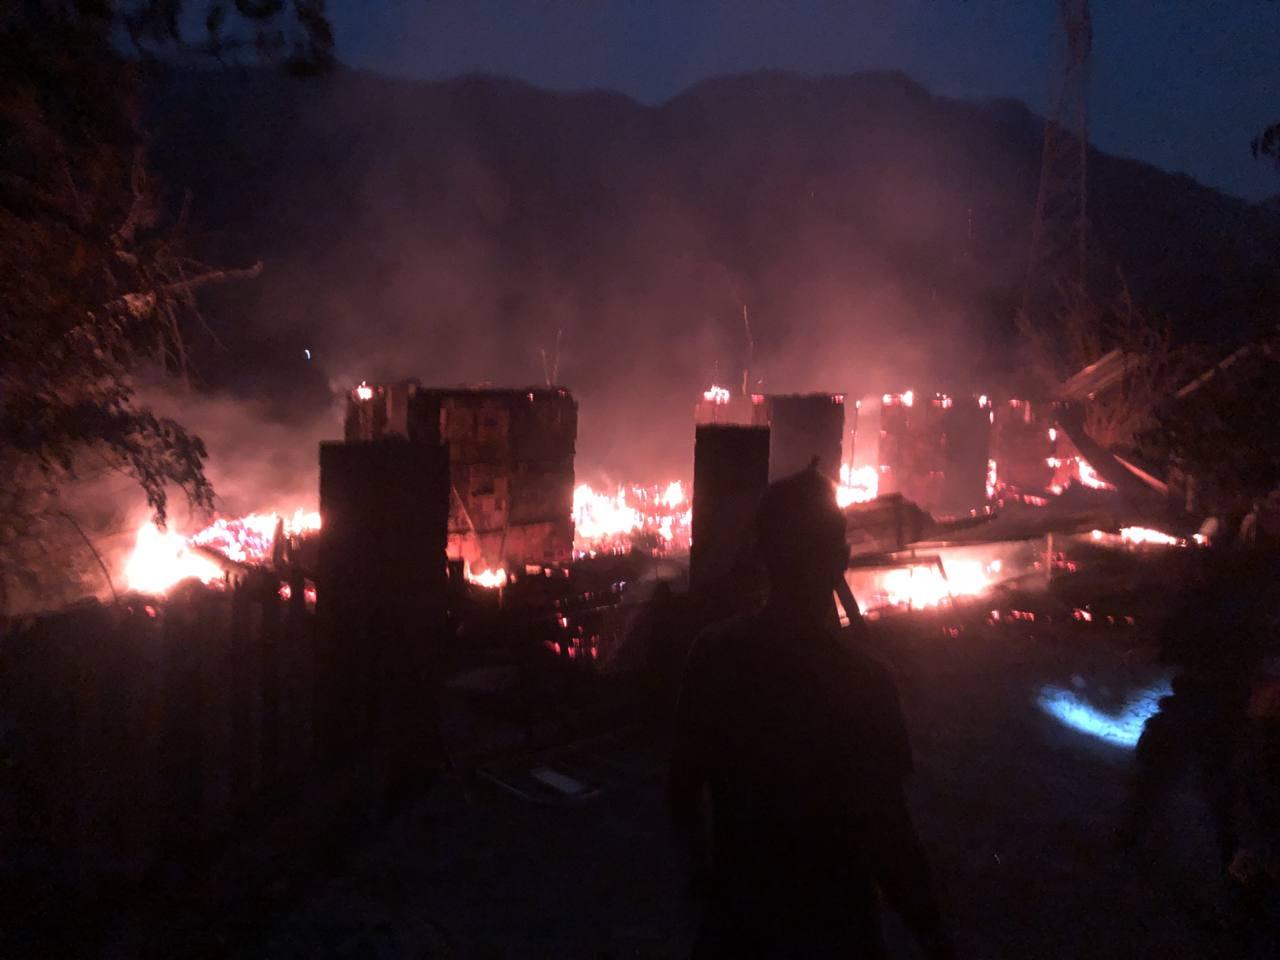 Yaylada yangın söndürüldü